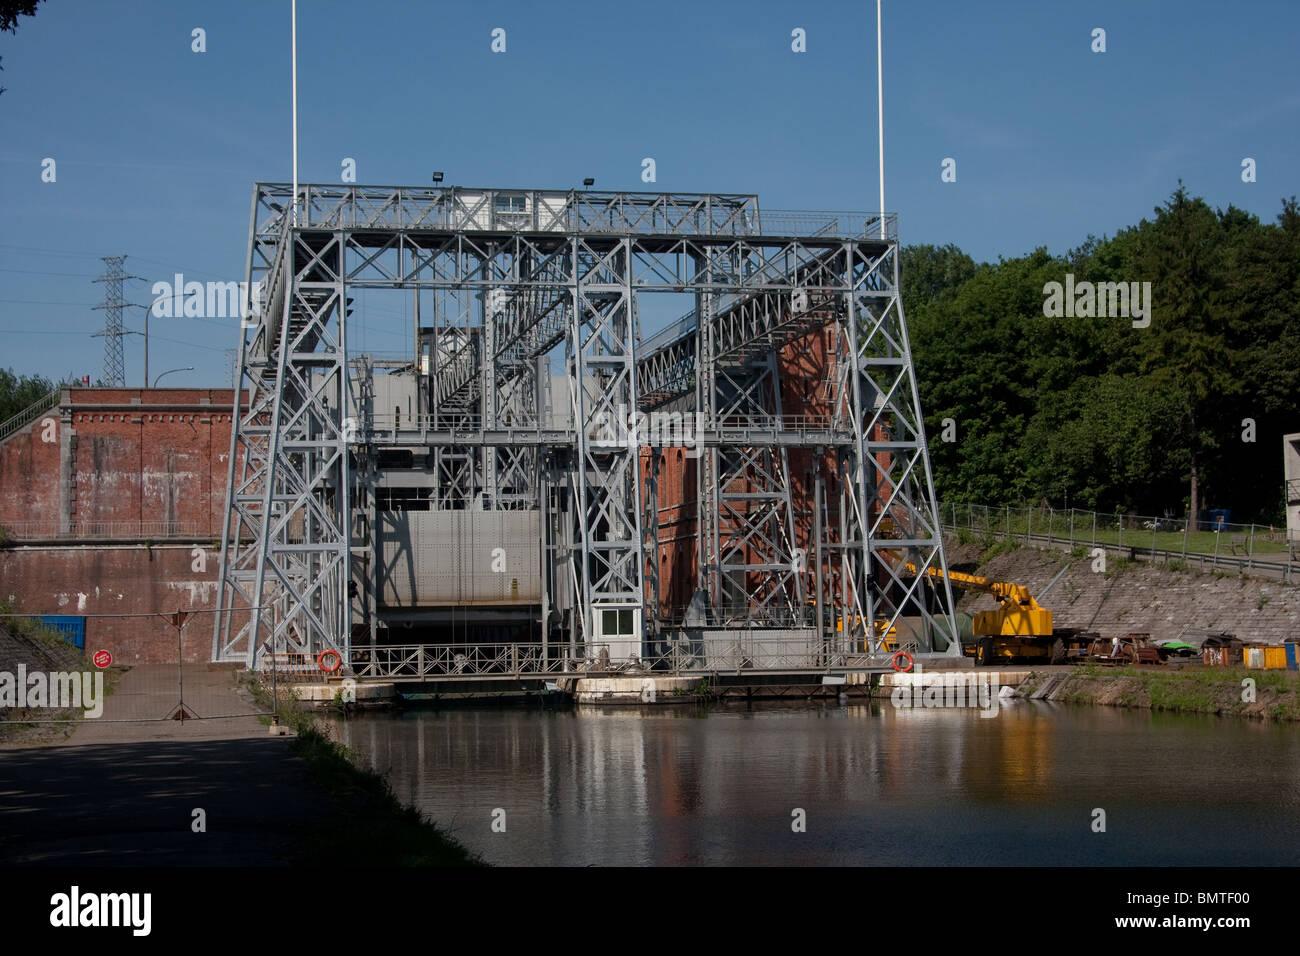 hydraulische Boot heben Canal du Centre Cantine des Italiens La Louviere Belgien Stockbild